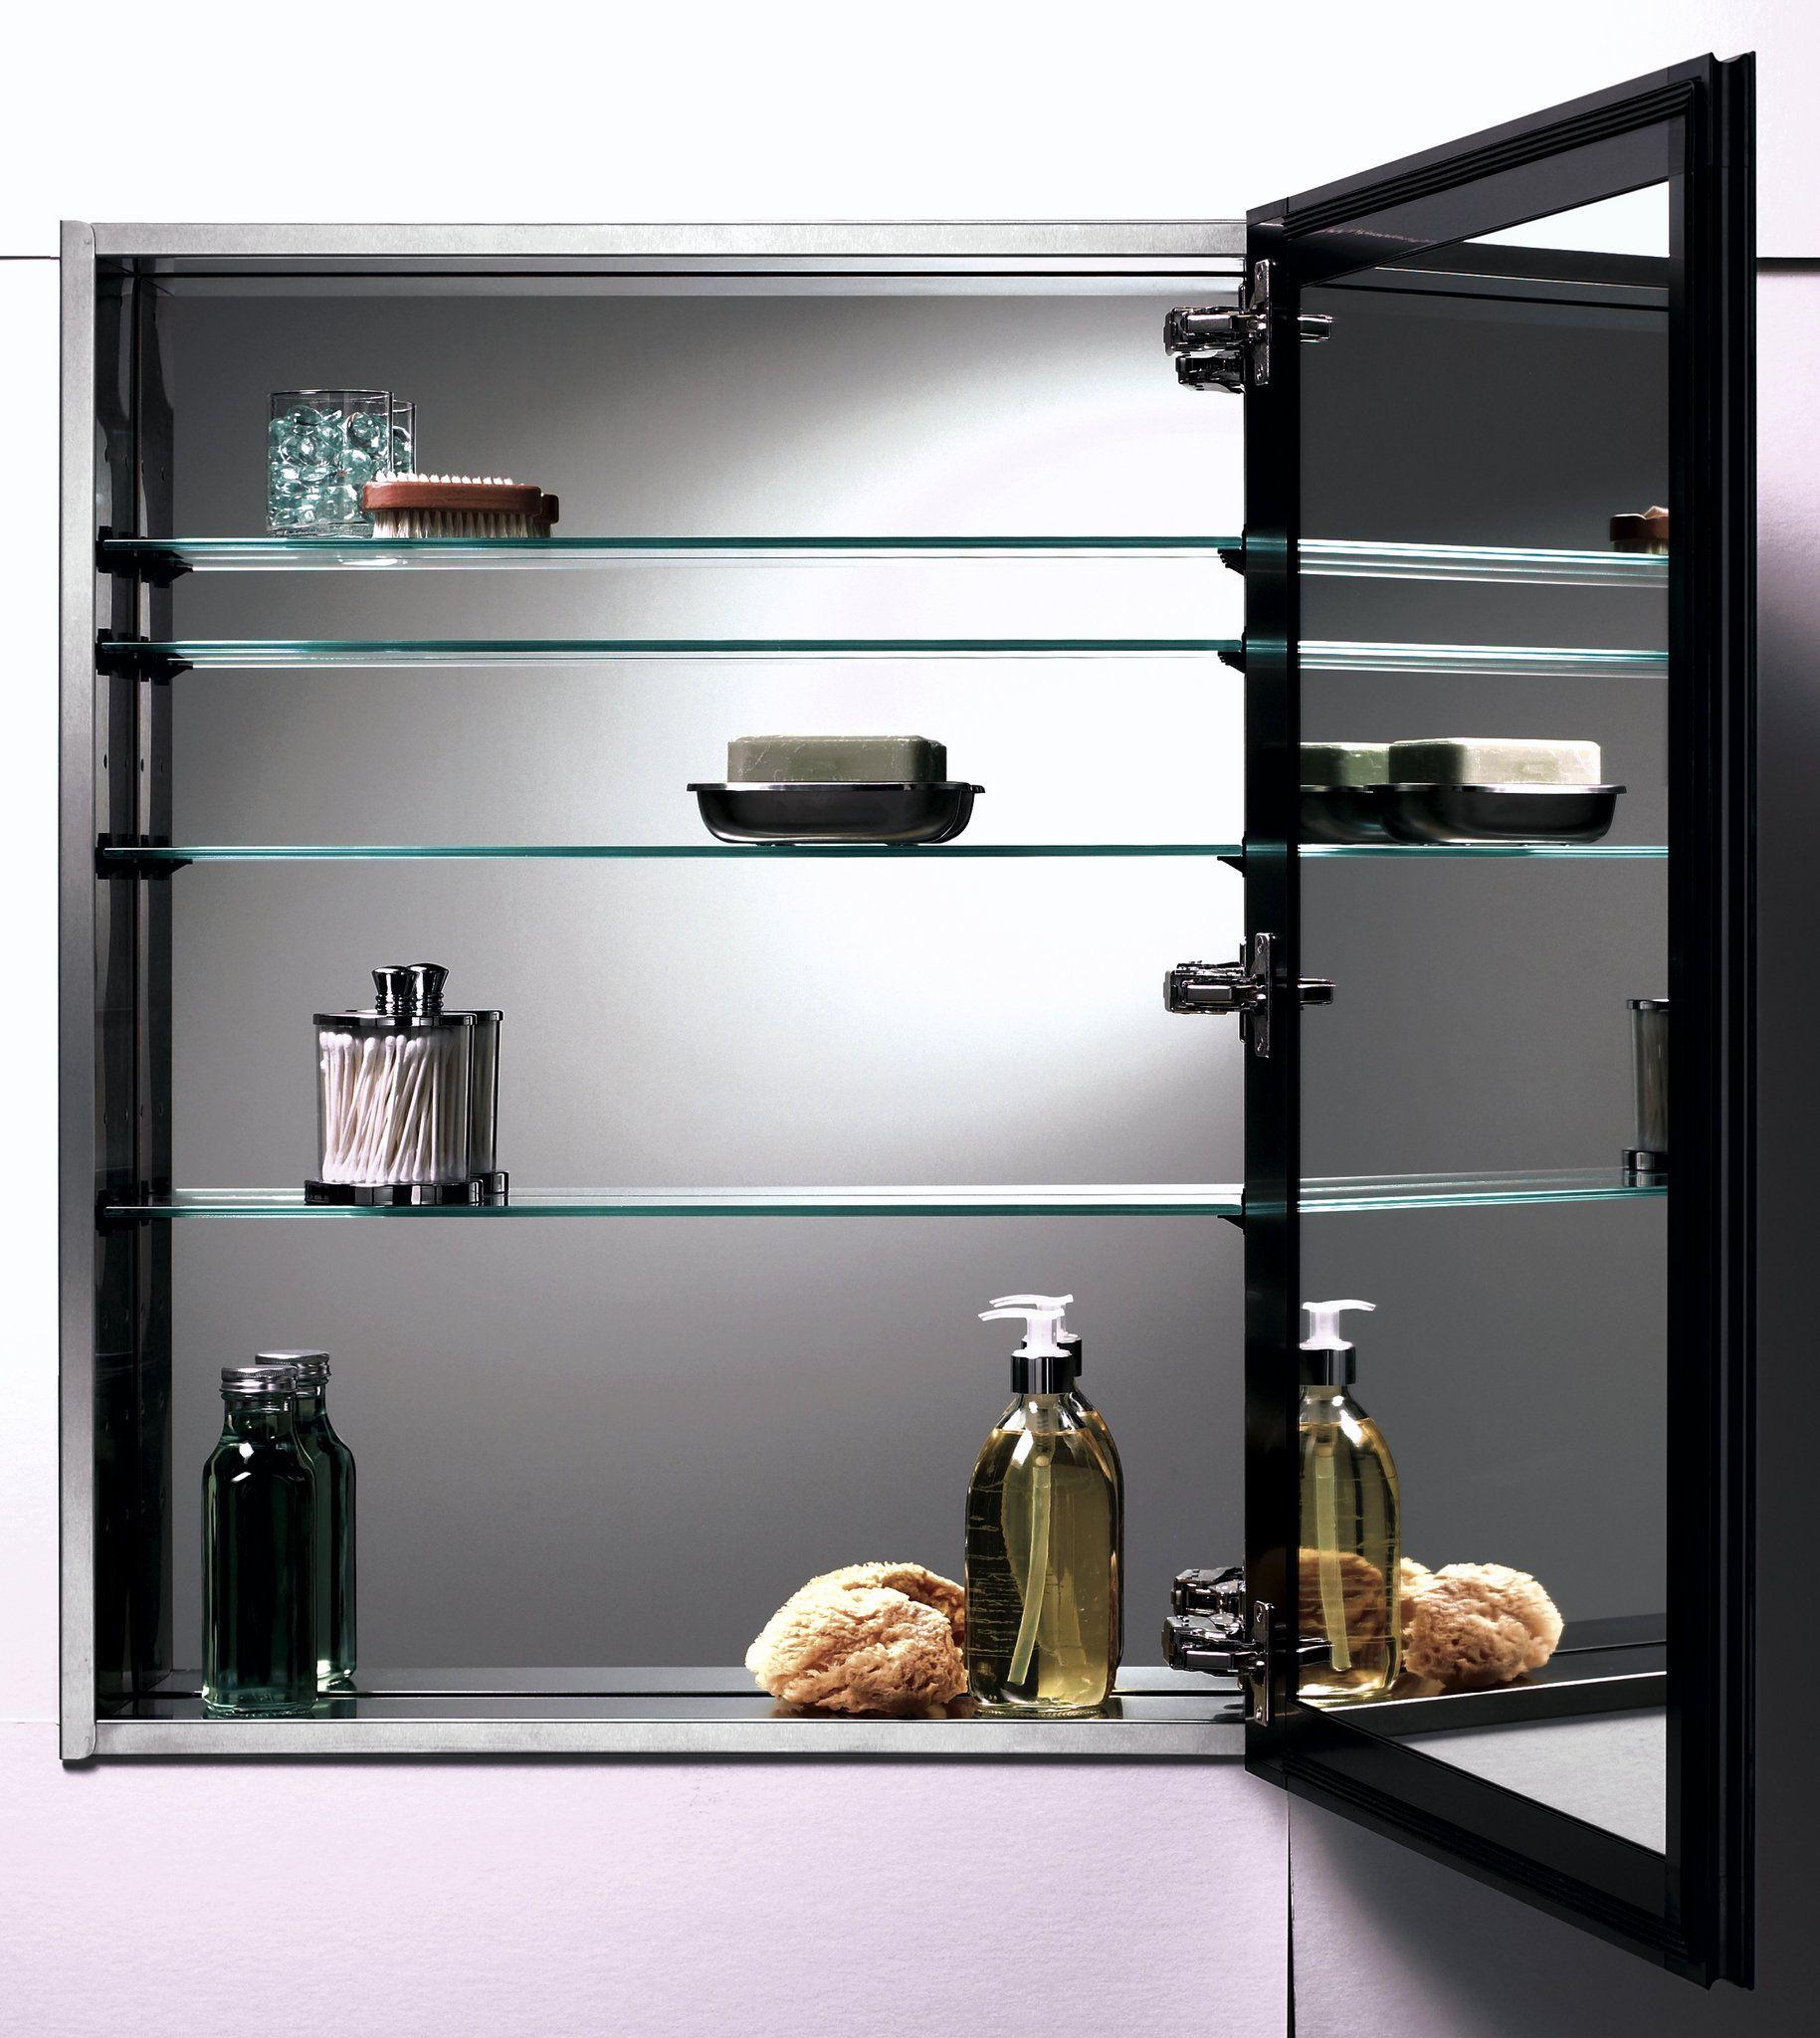 Best Photo Gallery Websites Bathroom Design Bathroom Black Framed Mirror Bathroom On Wall Cabinet Door Mixed Glass Hidden Racks